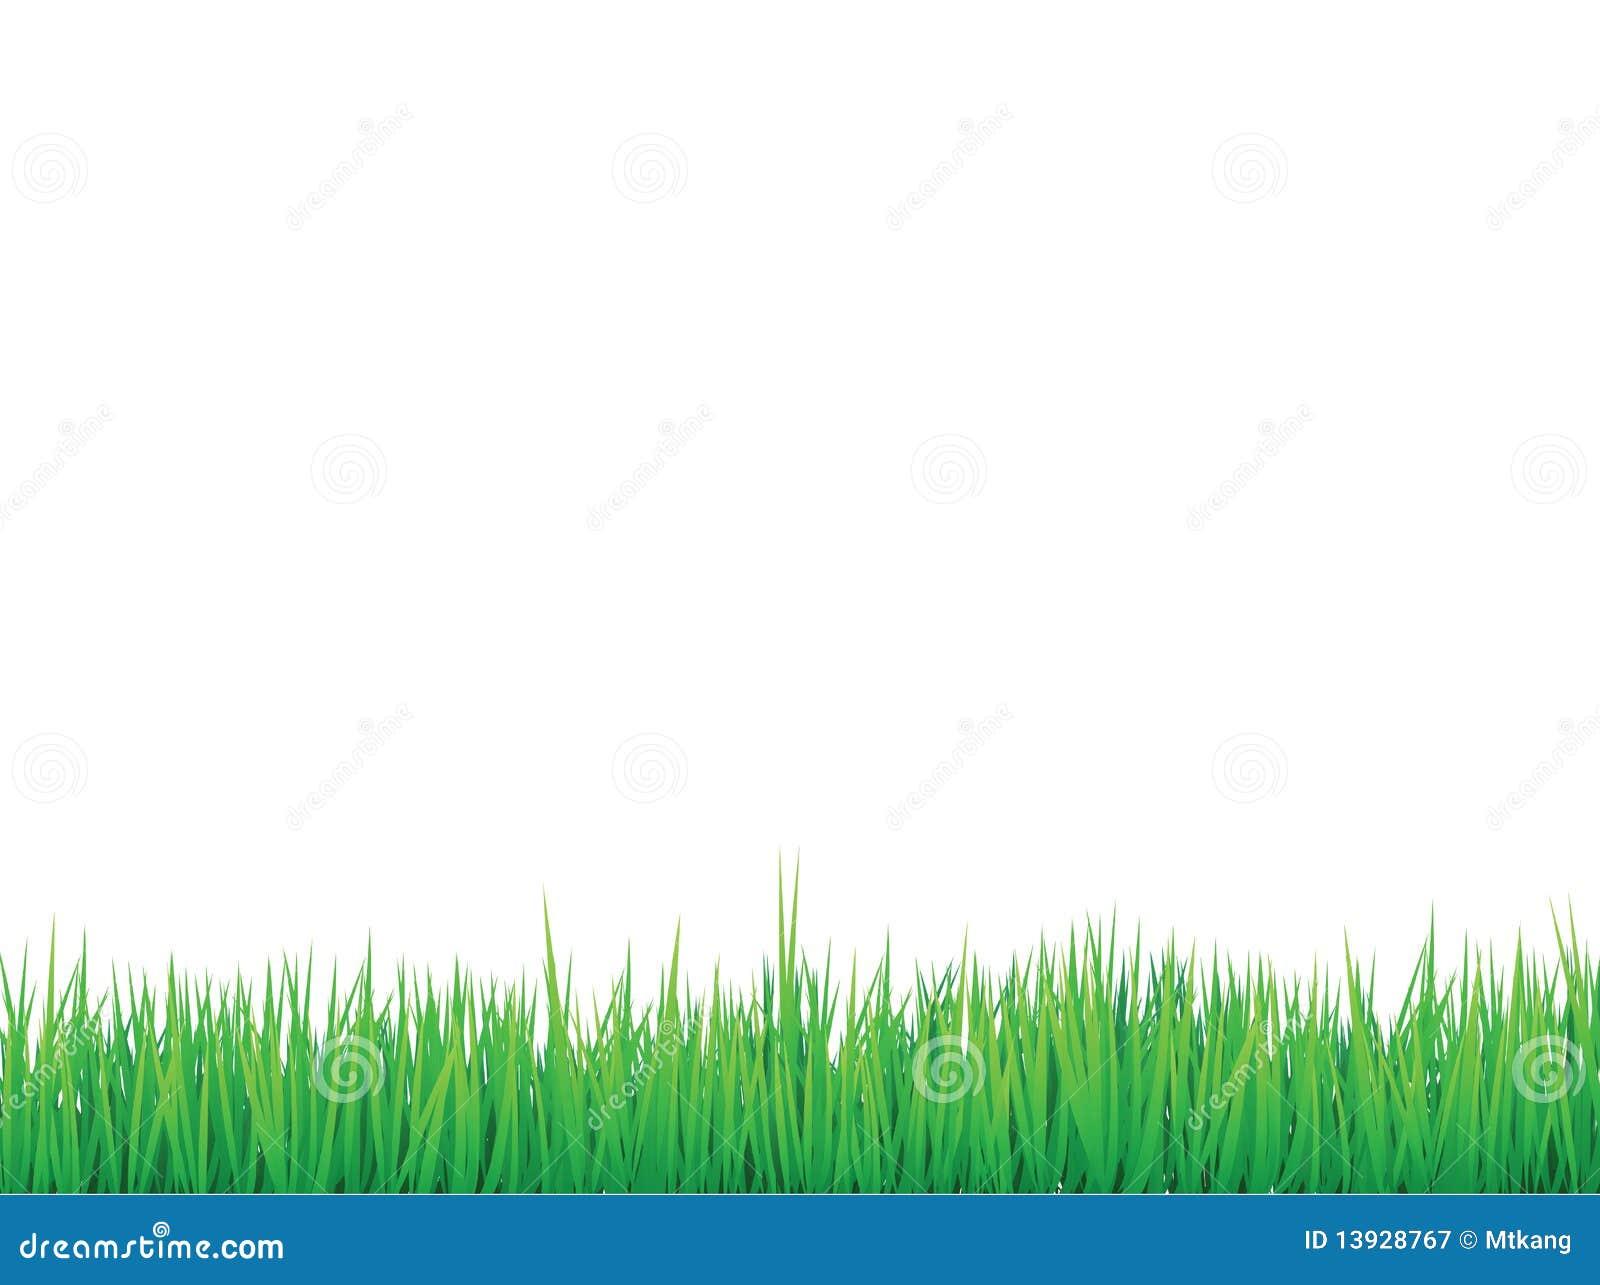 grass borders background stock vector illustration of floor 13928767 rh dreamstime com Free Cartoon Golf Clip Art Free Golf Graphics